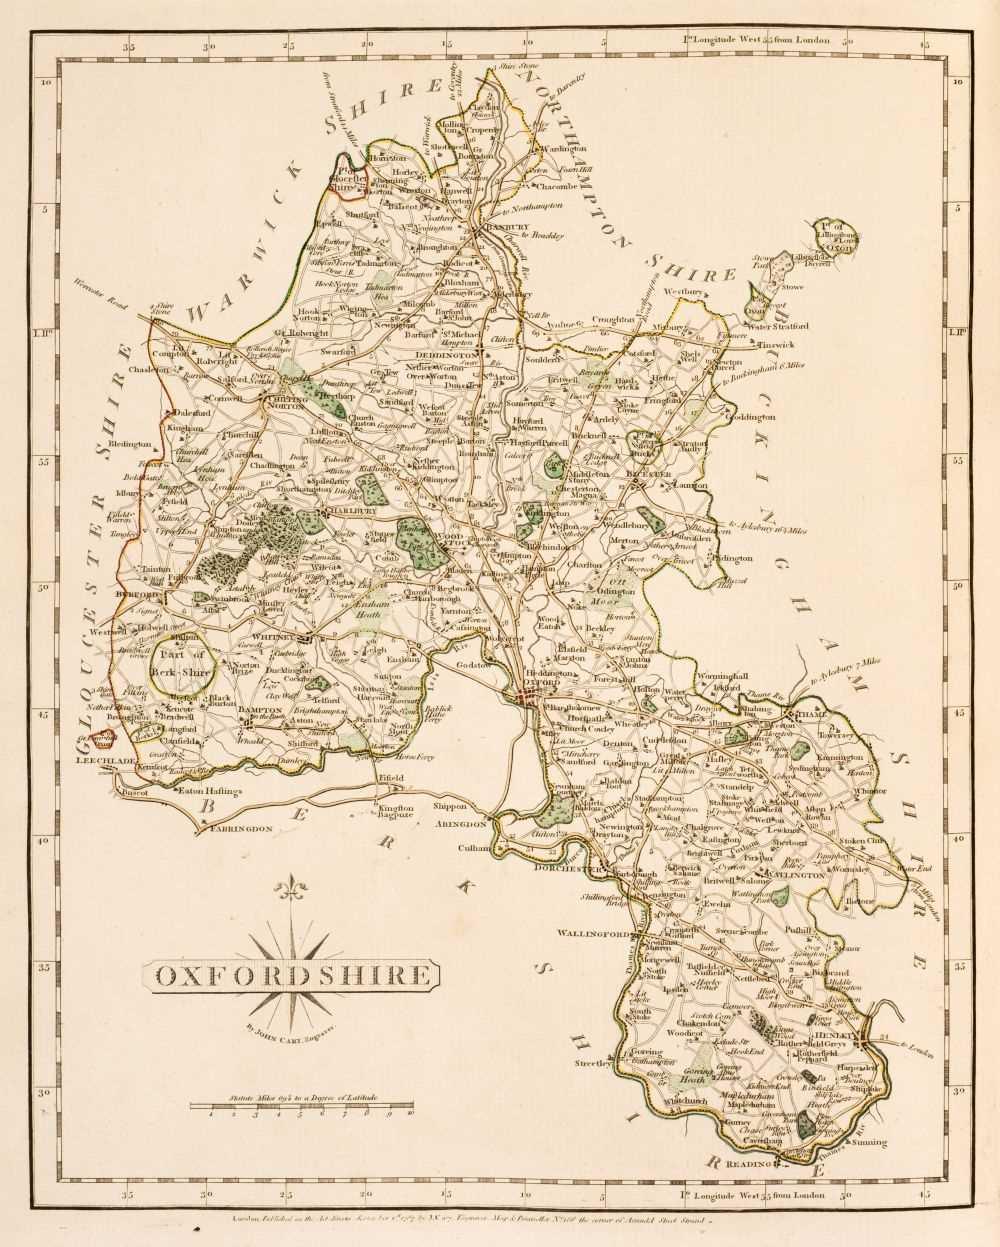 Lot 41 - Cary (John). Cary's New and Correct English Atlas.., 1st edition, 1787